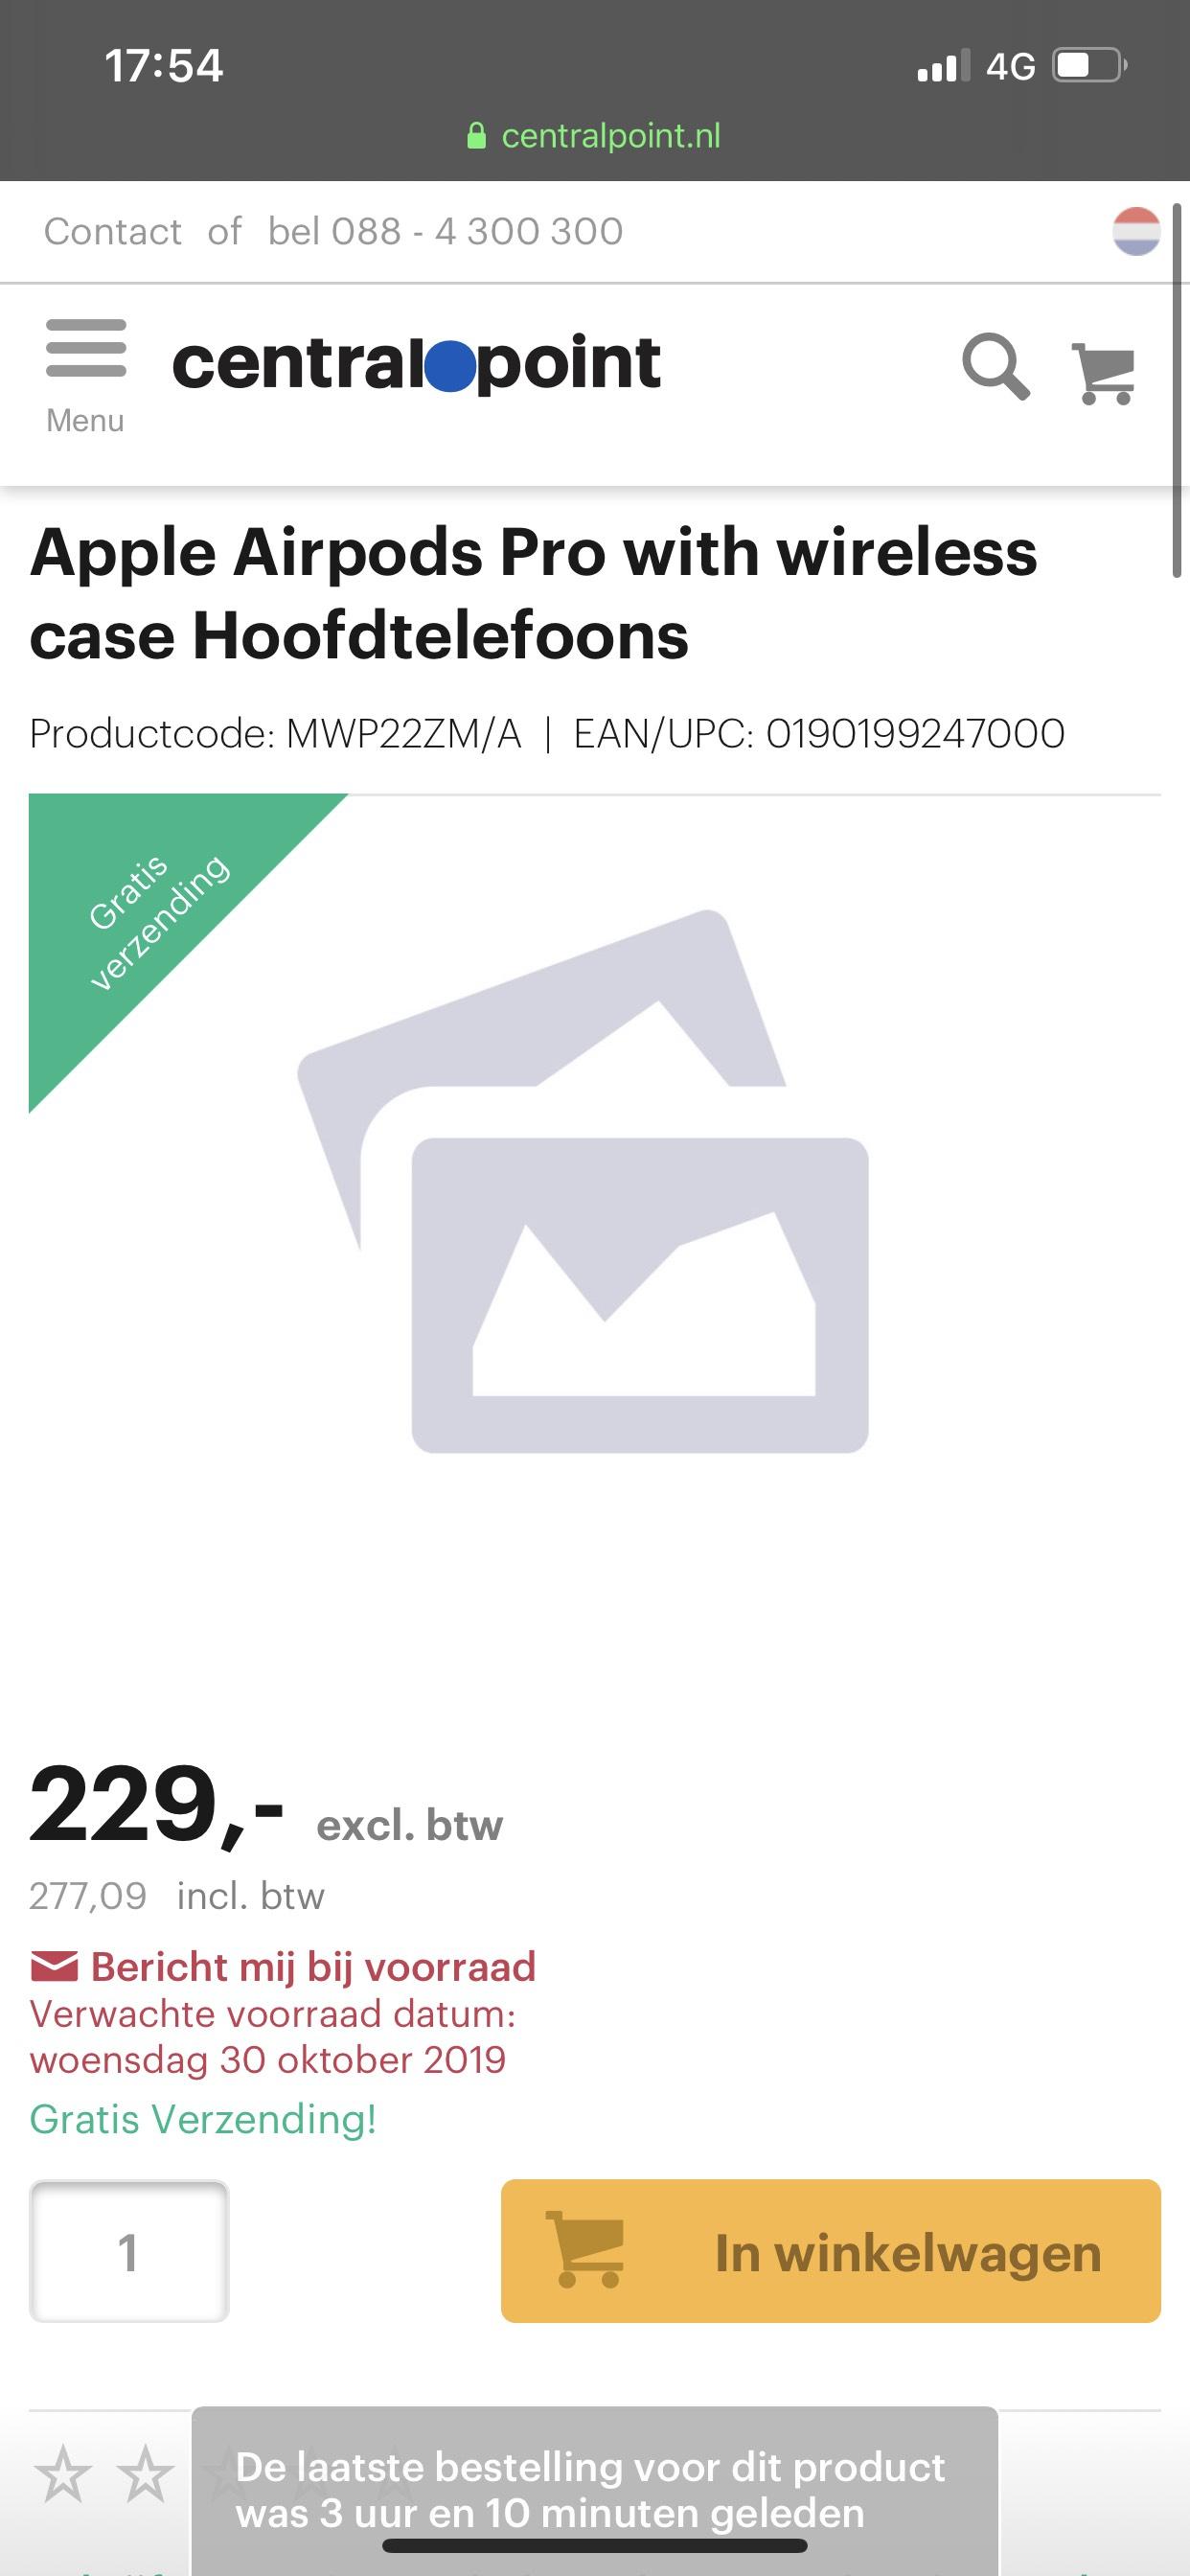 842745-cKbhR.jpg